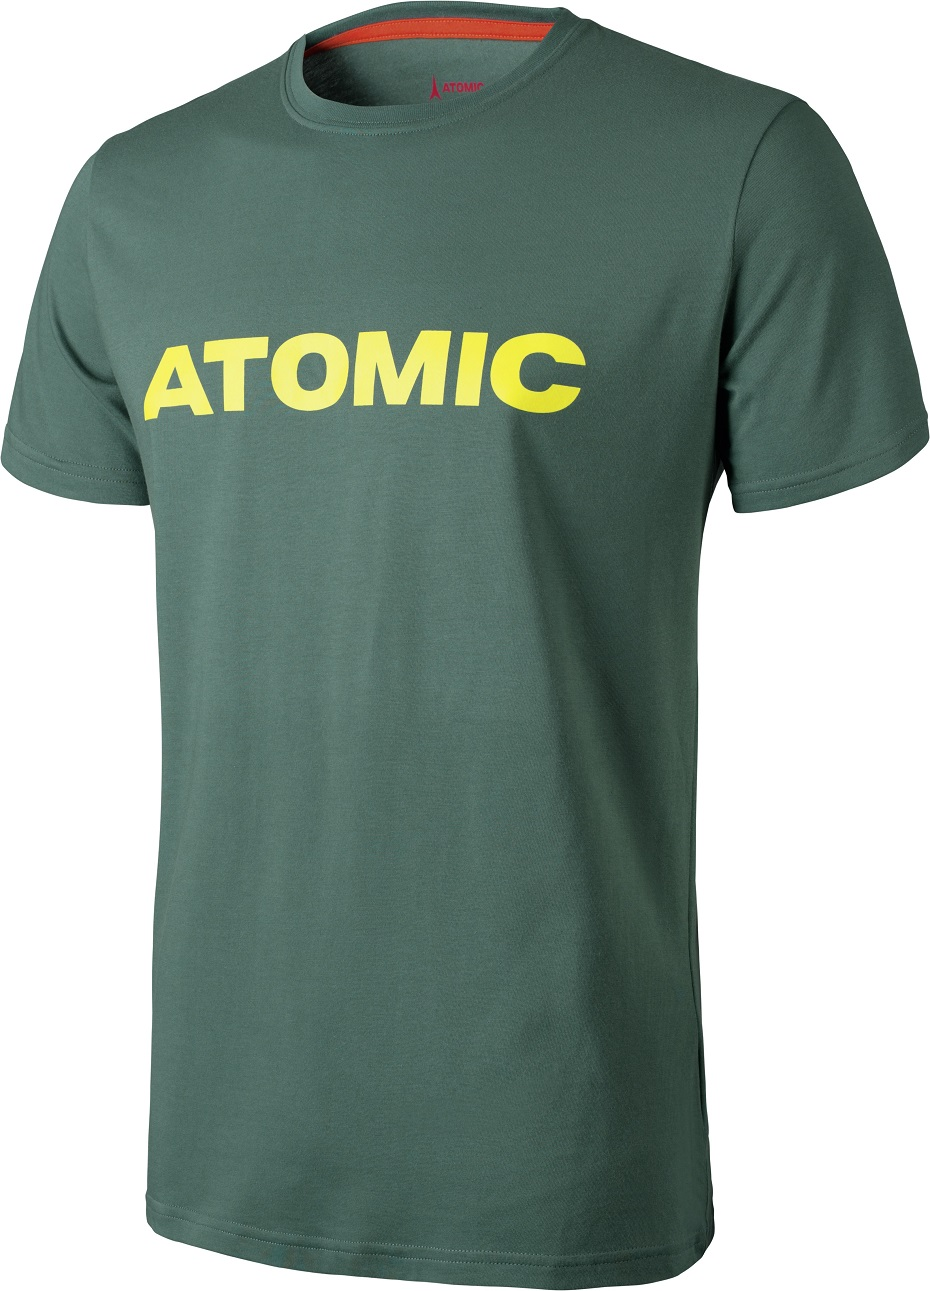 Atomic Alps T Shirt